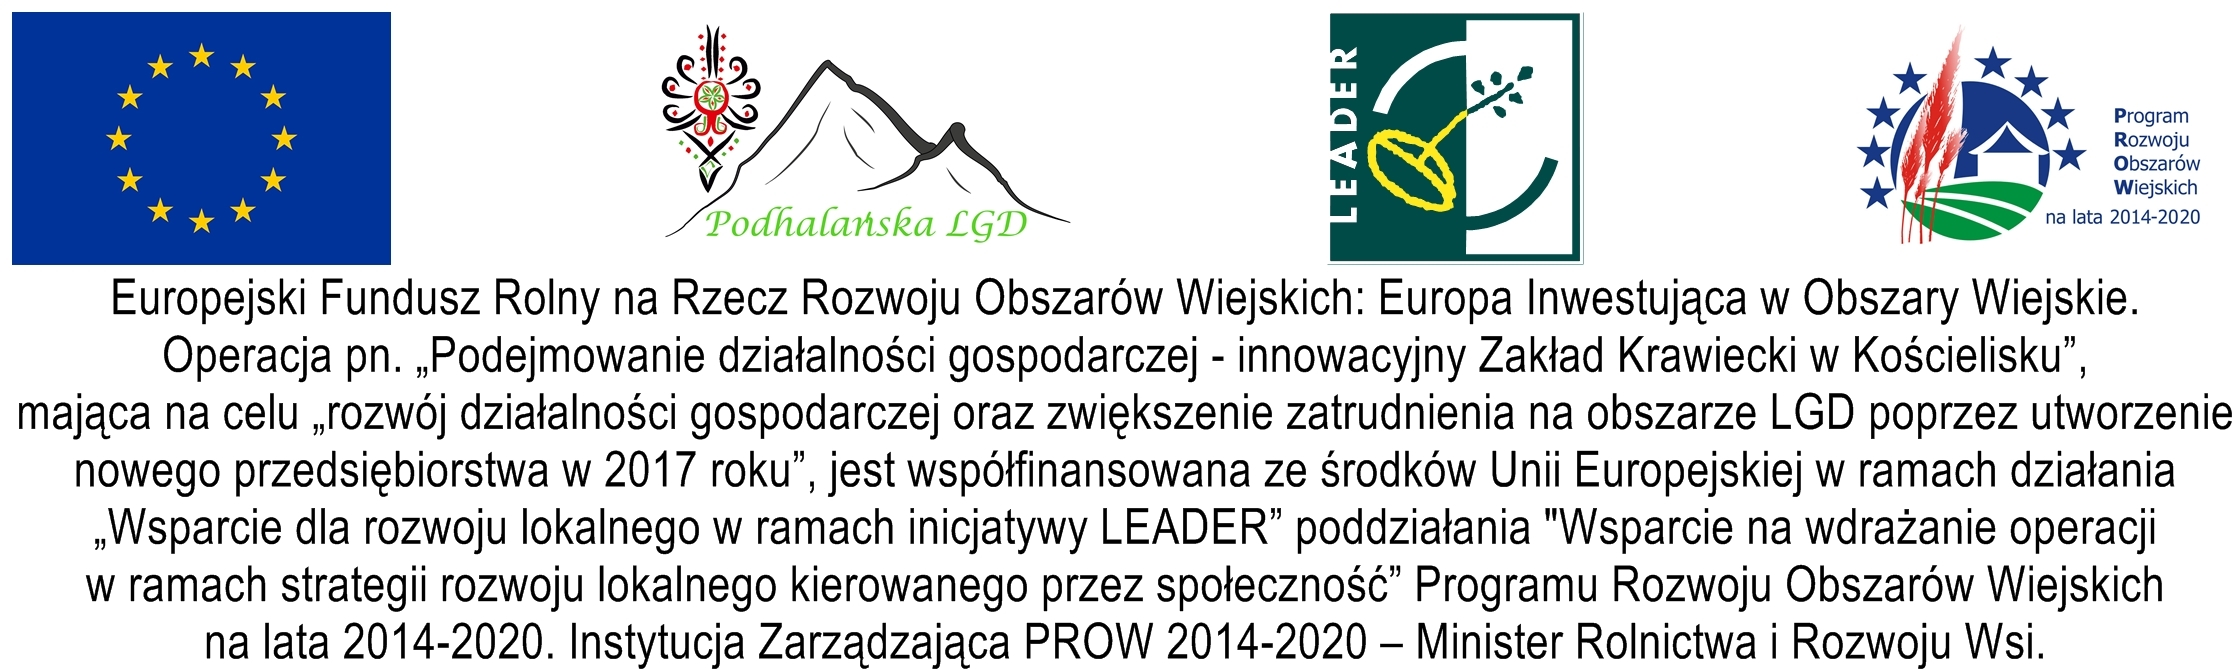 Piekara Zofia - tablica